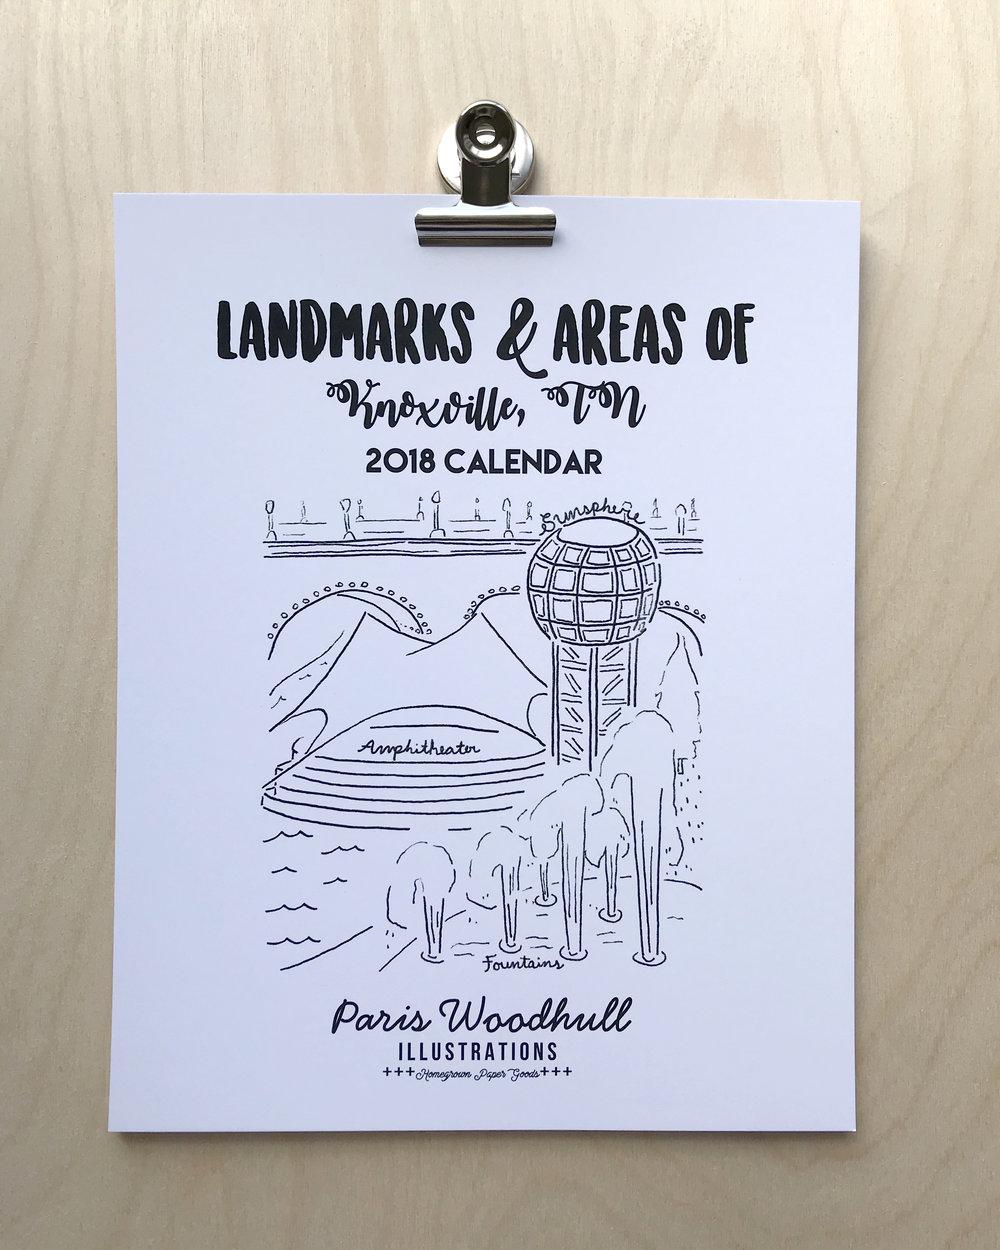 2018 calendar knoxville landmarks areas paris woodhull illustrations